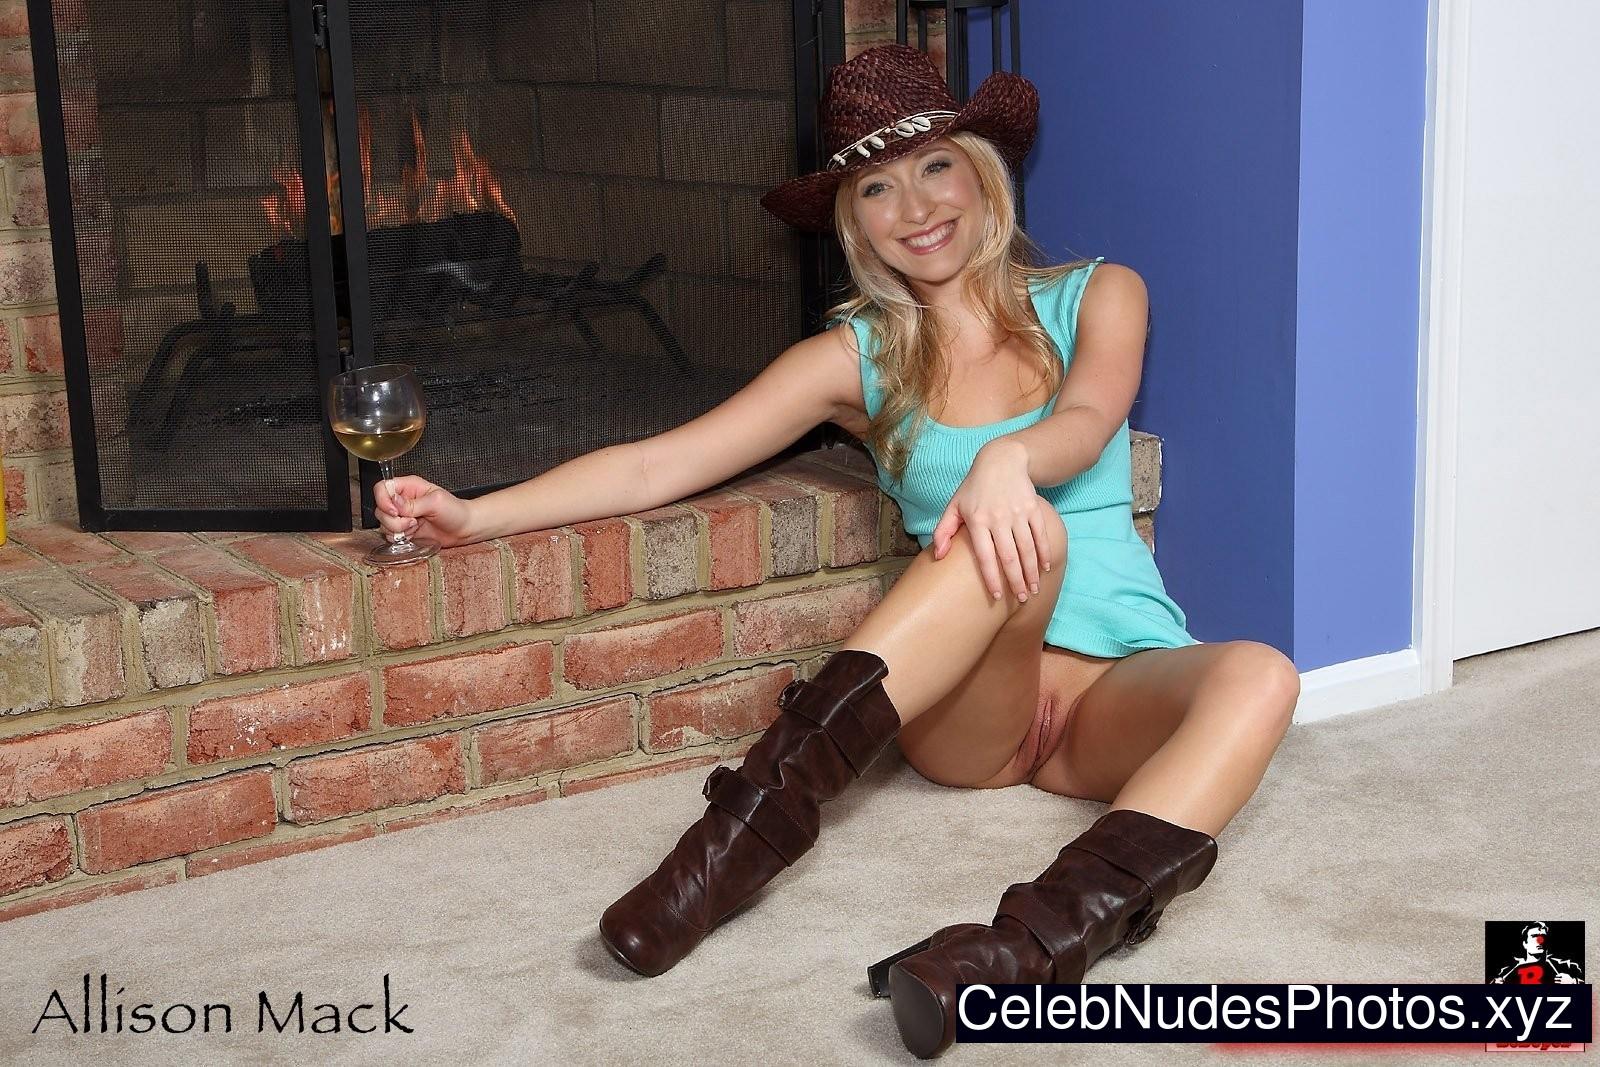 Would allison mack blowjob hot